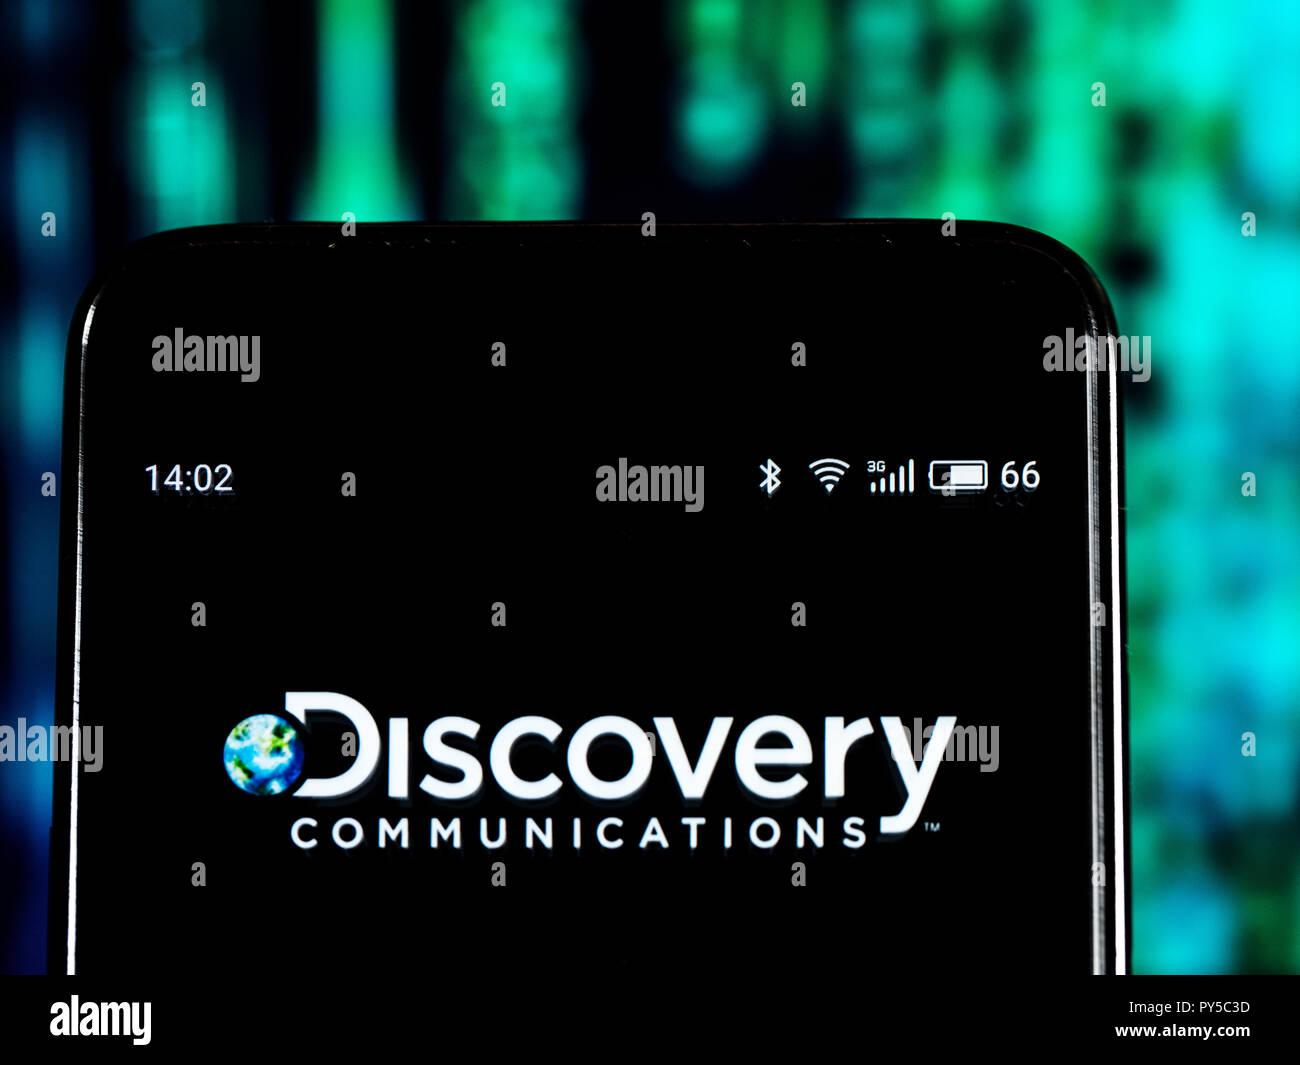 Discovery Inc Mass Media Company Logo Seen Displayed On